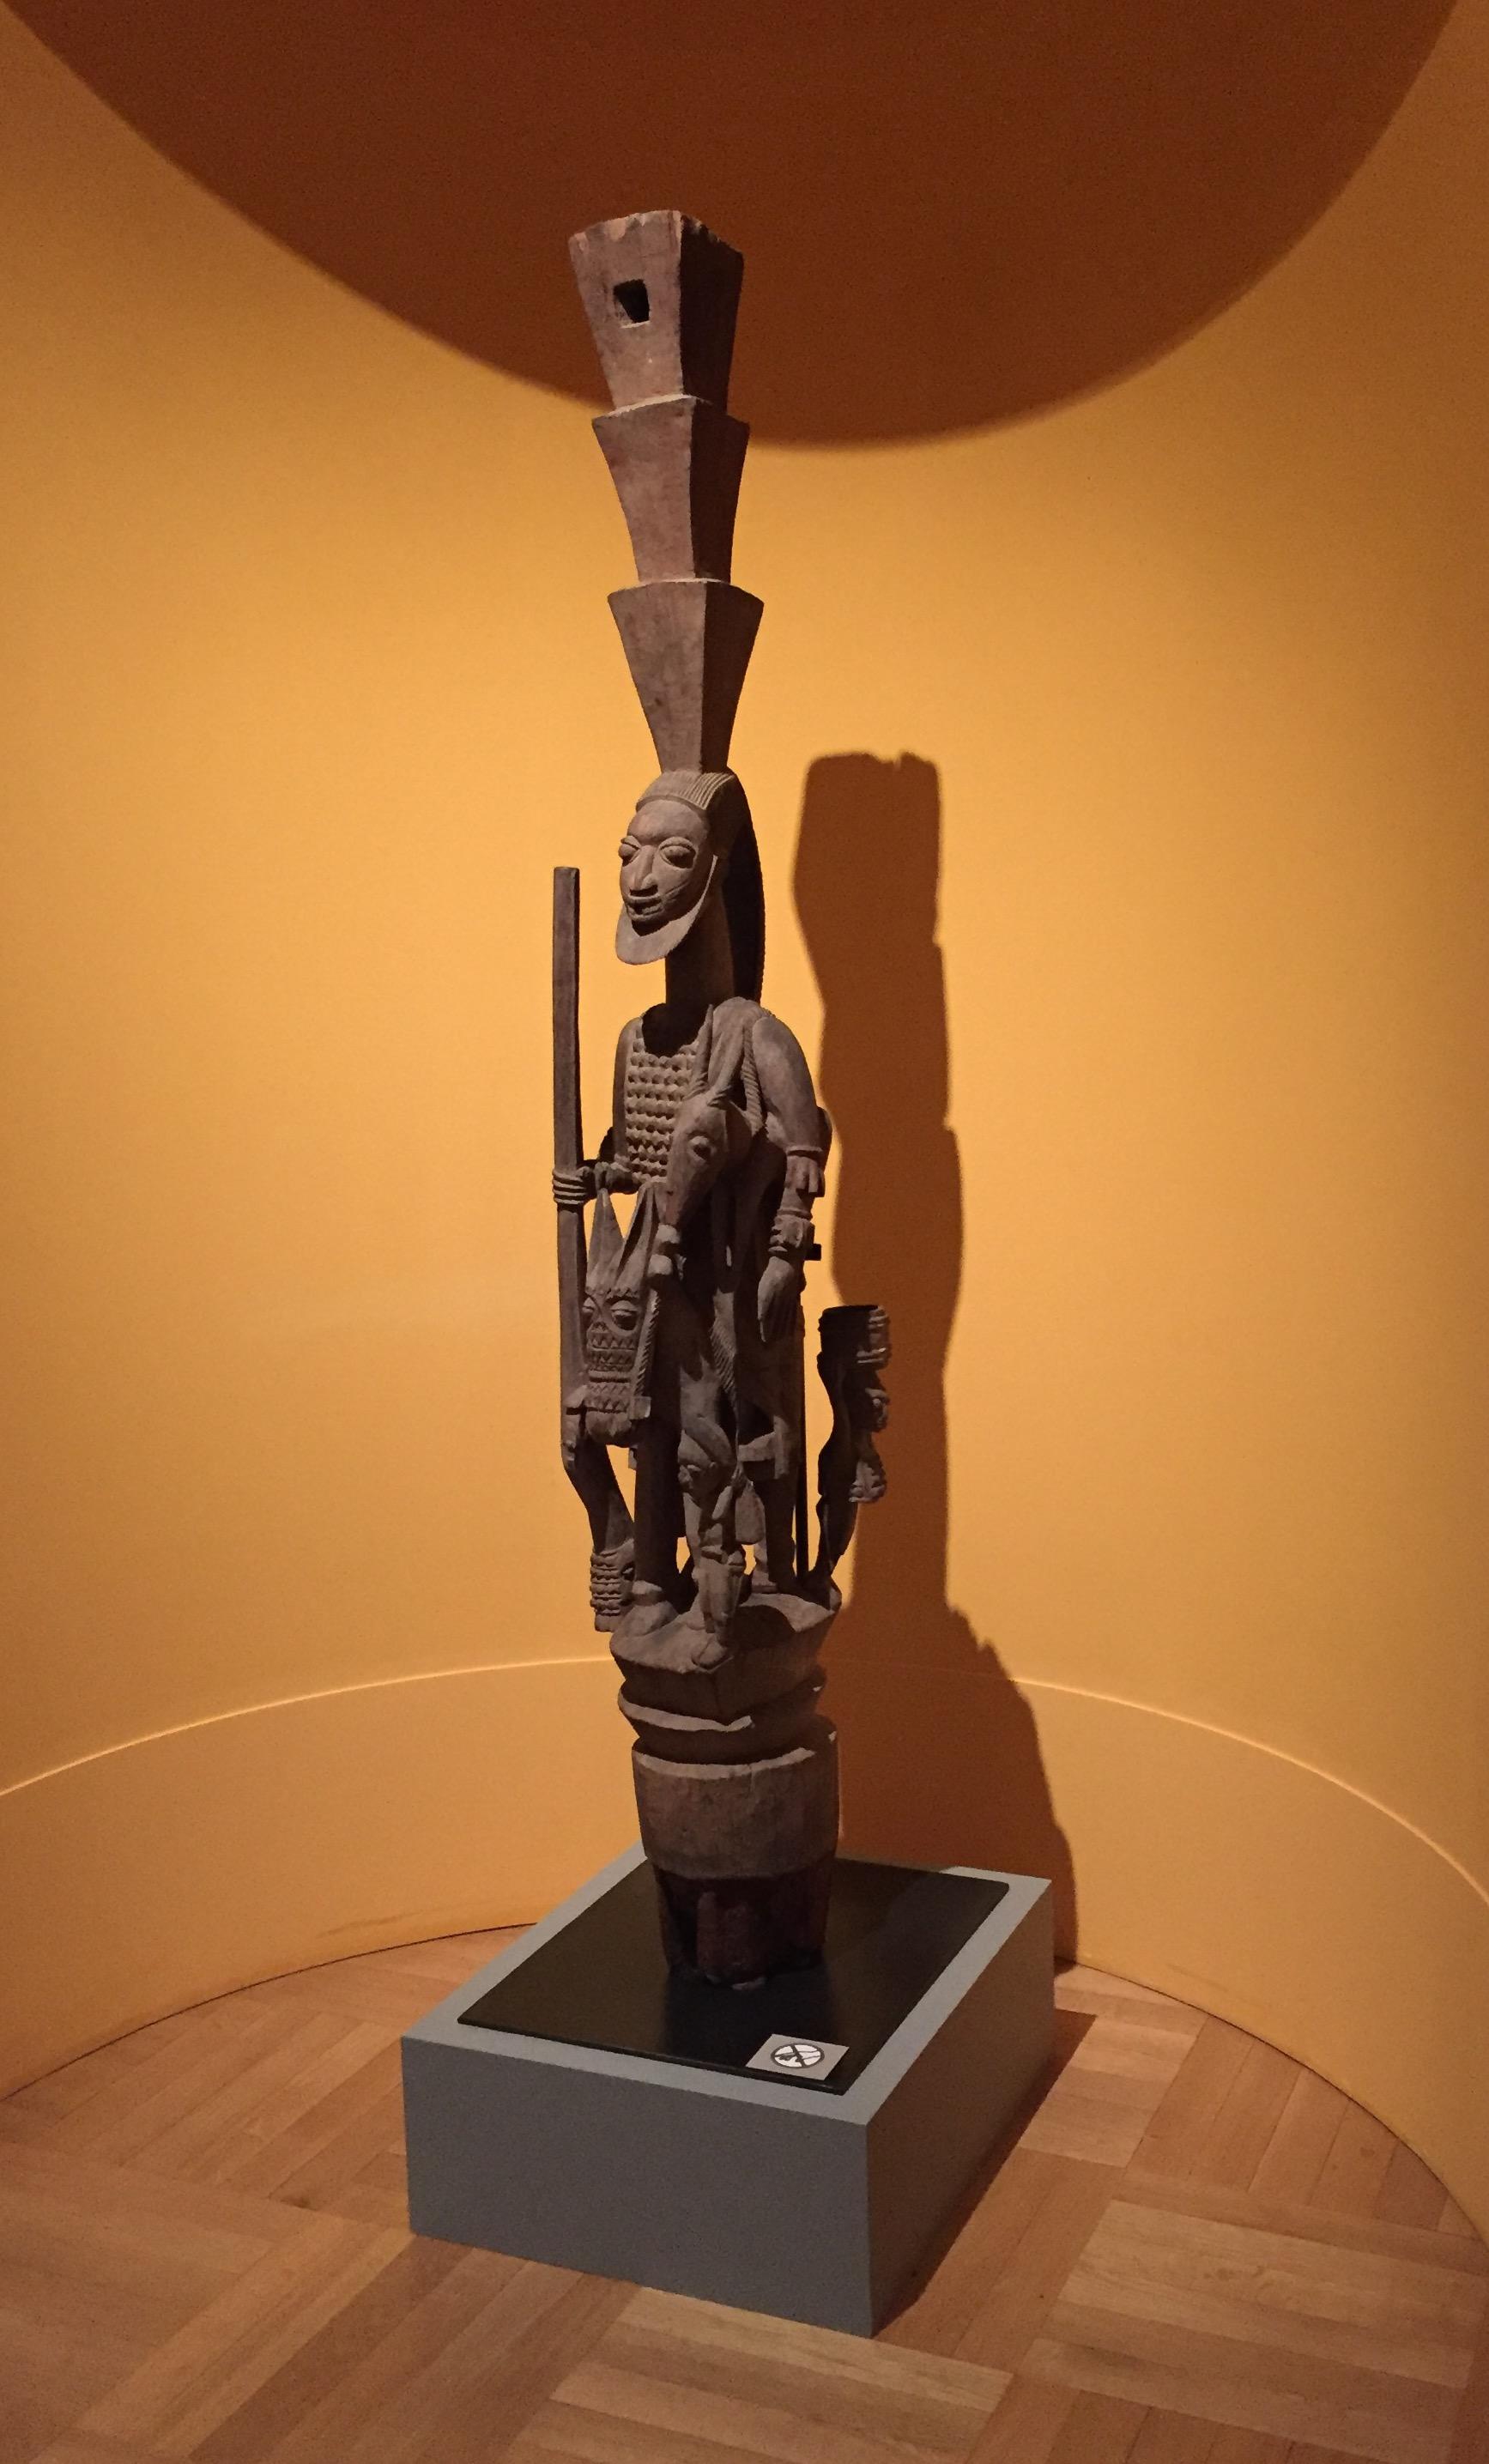 olowe-of-ise-housepost-yoruba-munich-museum-gerd-stoll-bruno-claessens